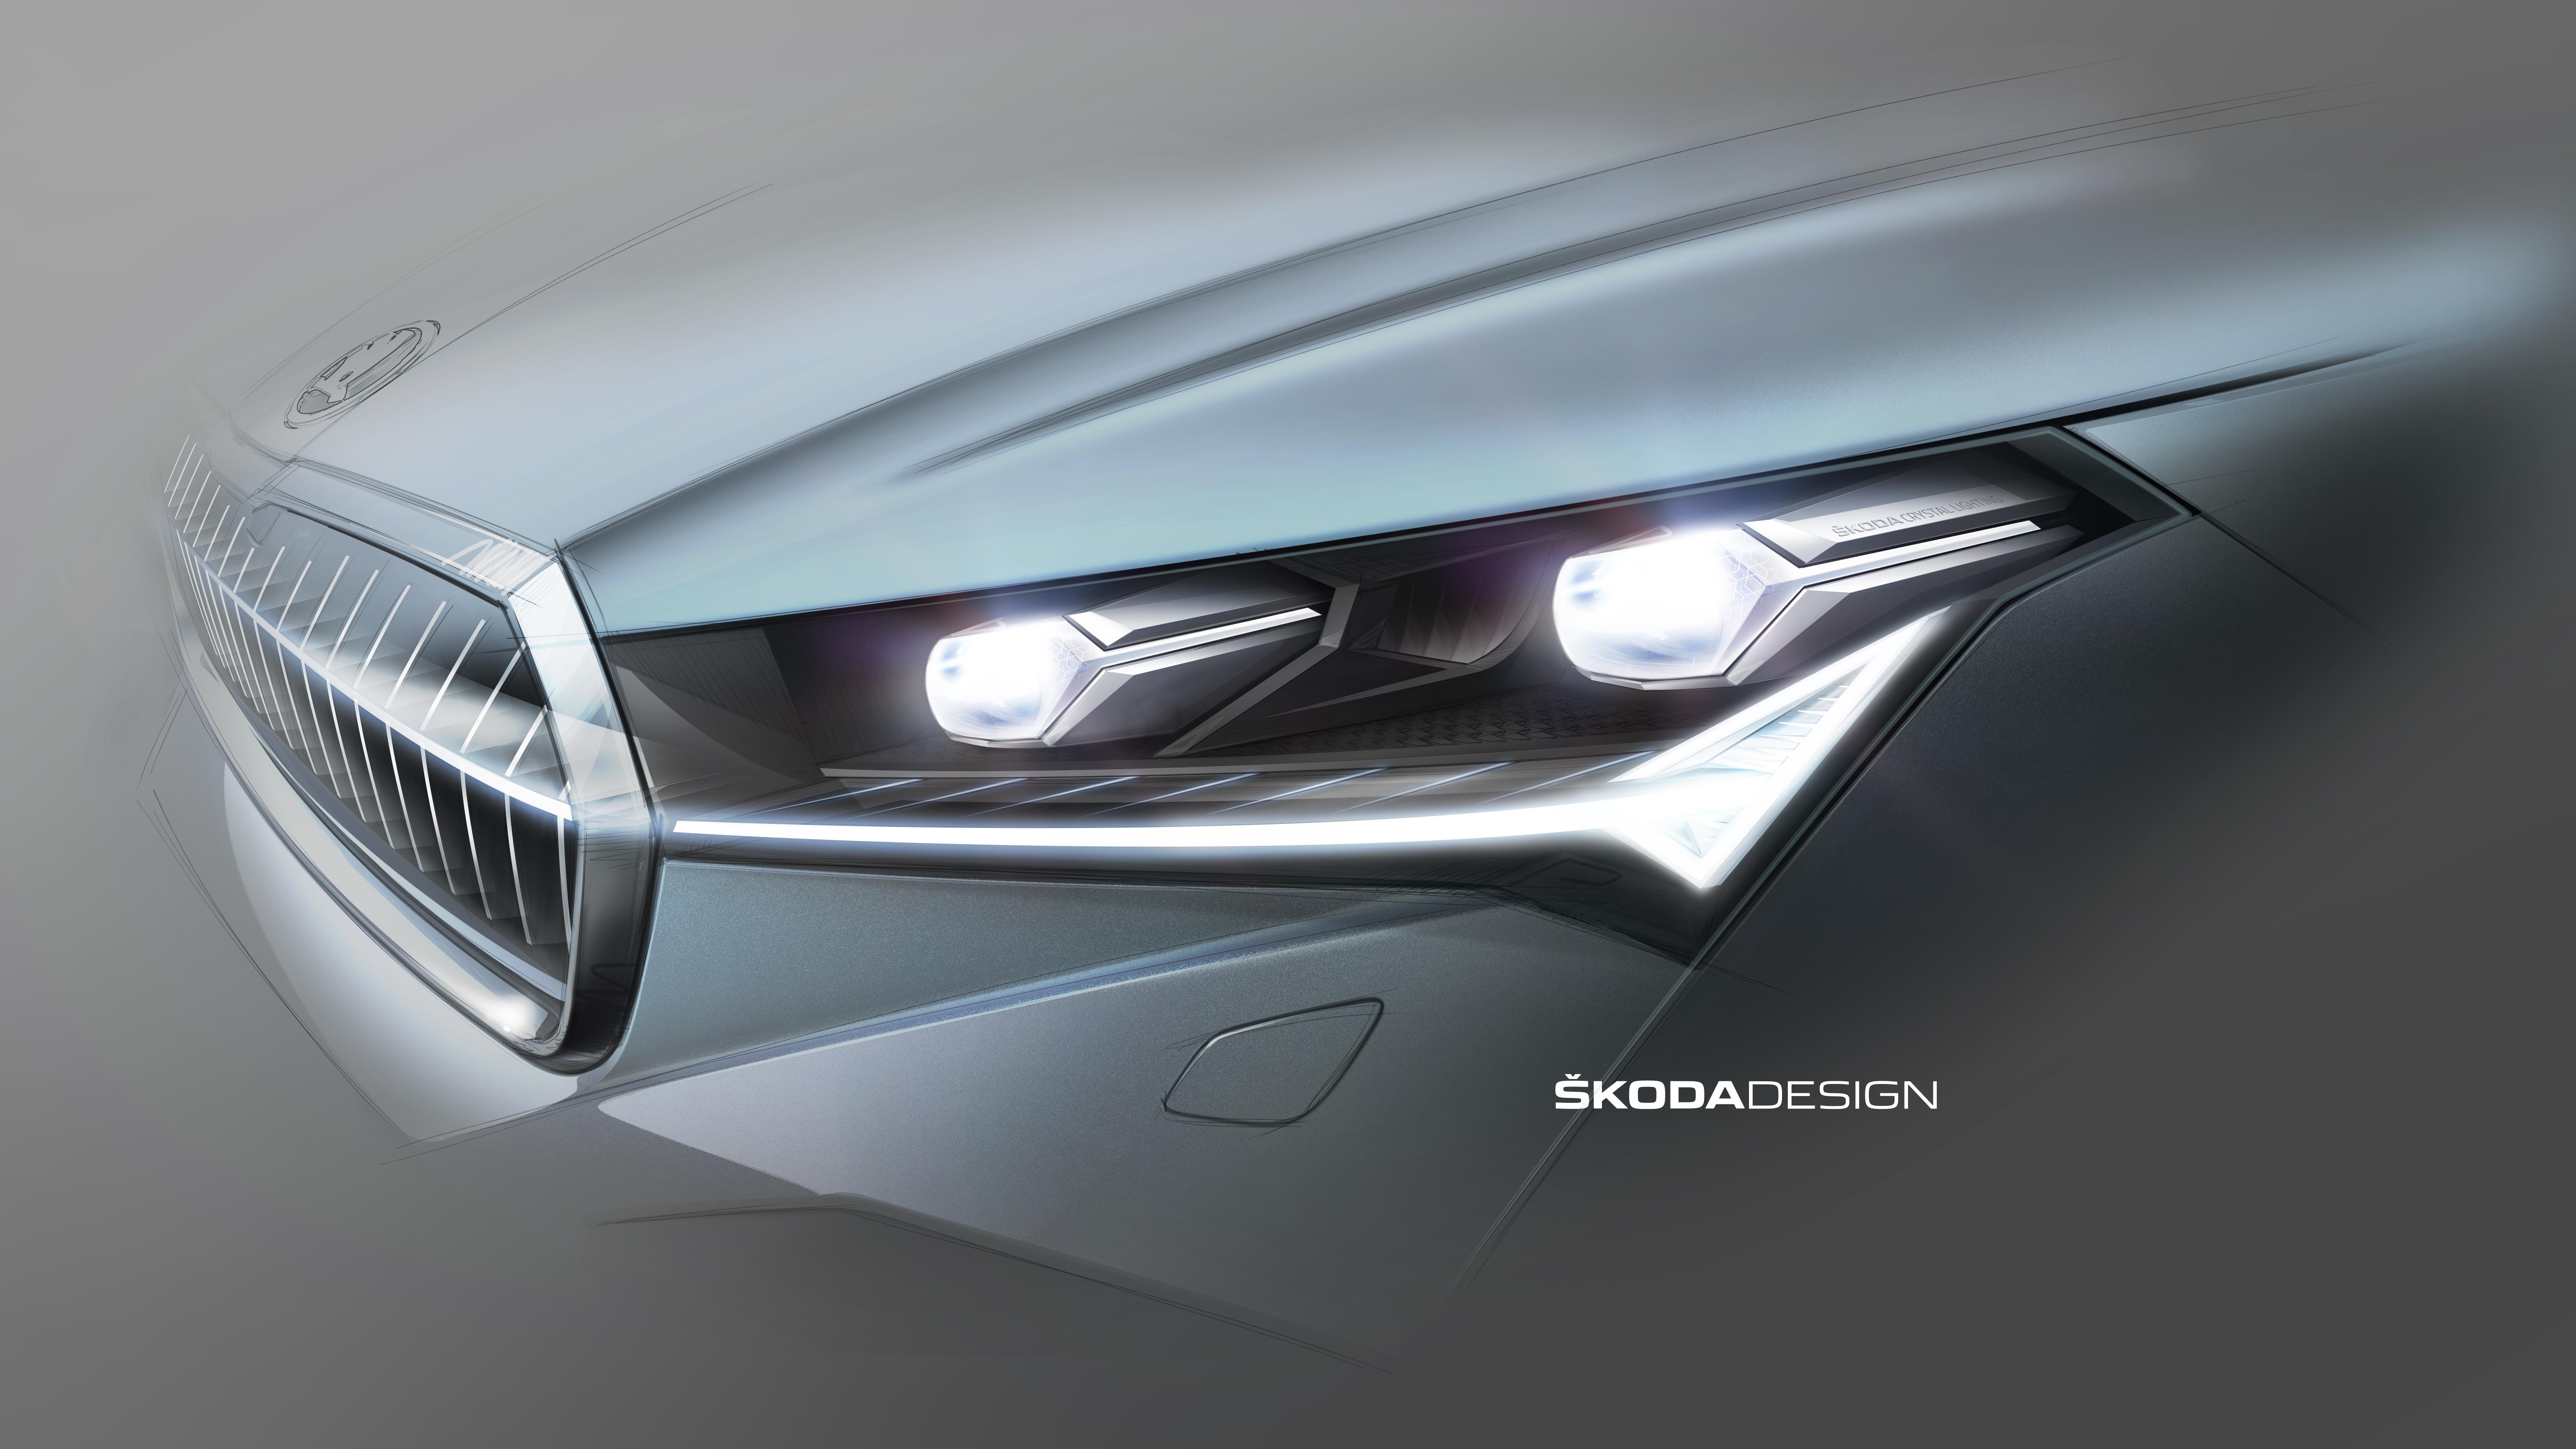 SKODA ENYAQ iV takes a fresh approach to lighting design - Image 1